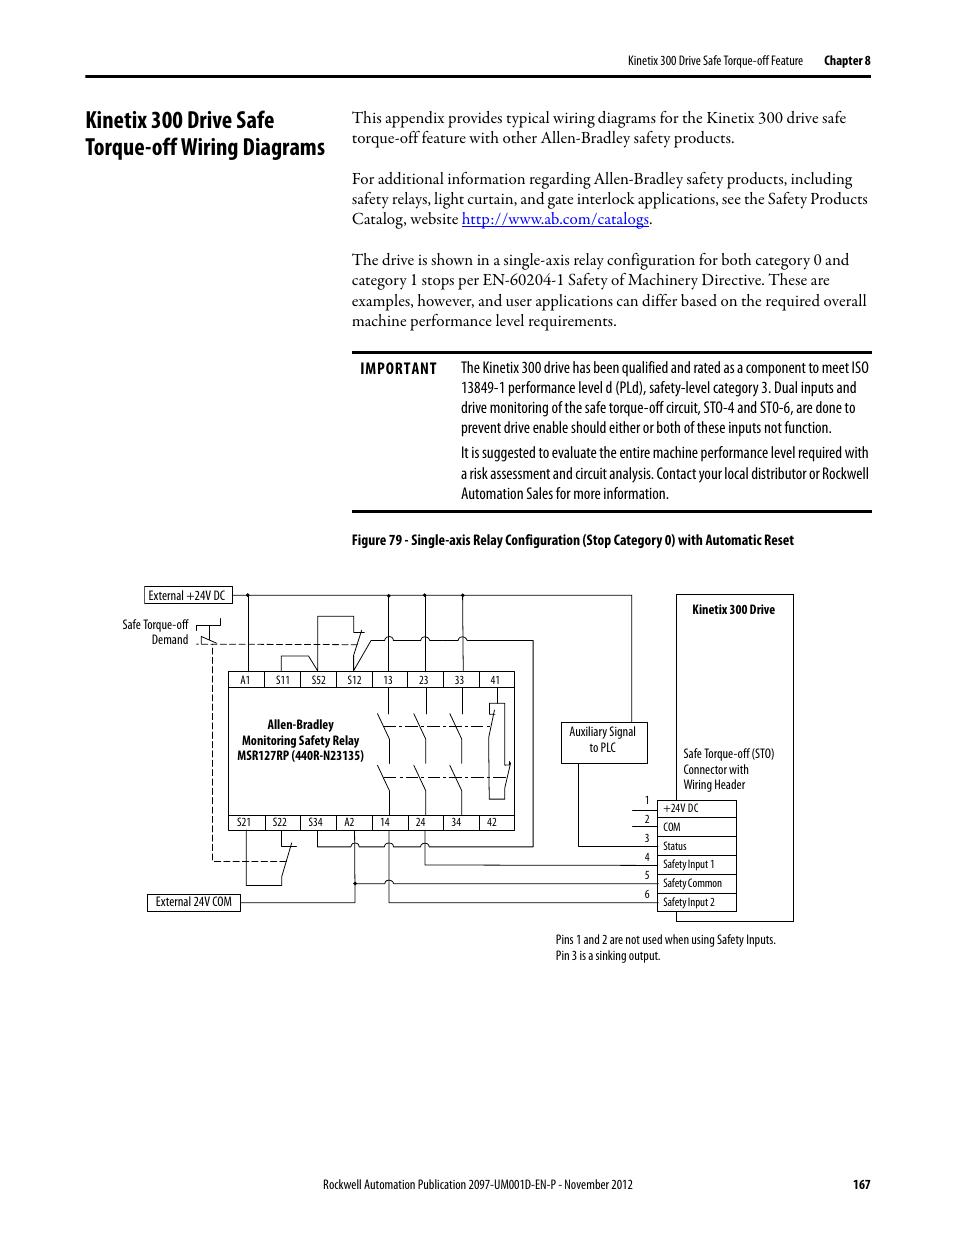 allen bradley relay wiring diagram kinetix 300 drive safe torque off wiring diagrams rockwell  kinetix 300 drive safe torque off